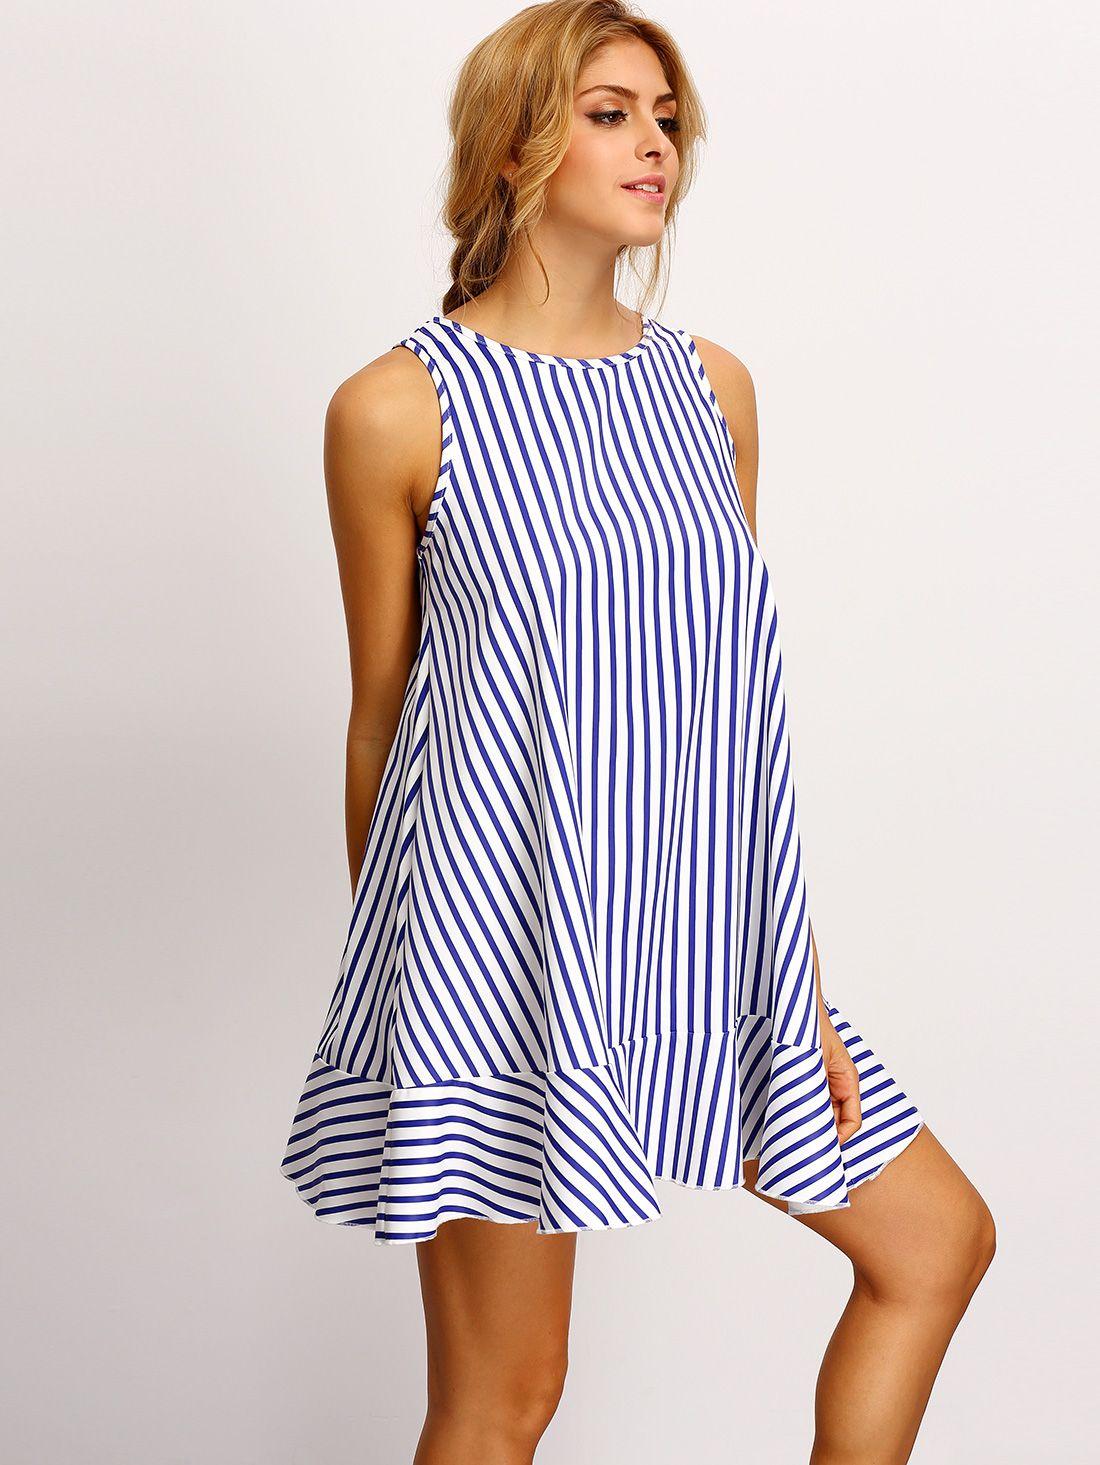 f19c907dee62 Tent Dresses Online & Vertical Stripes Tent Dress BLUE   MakeMeChic ...